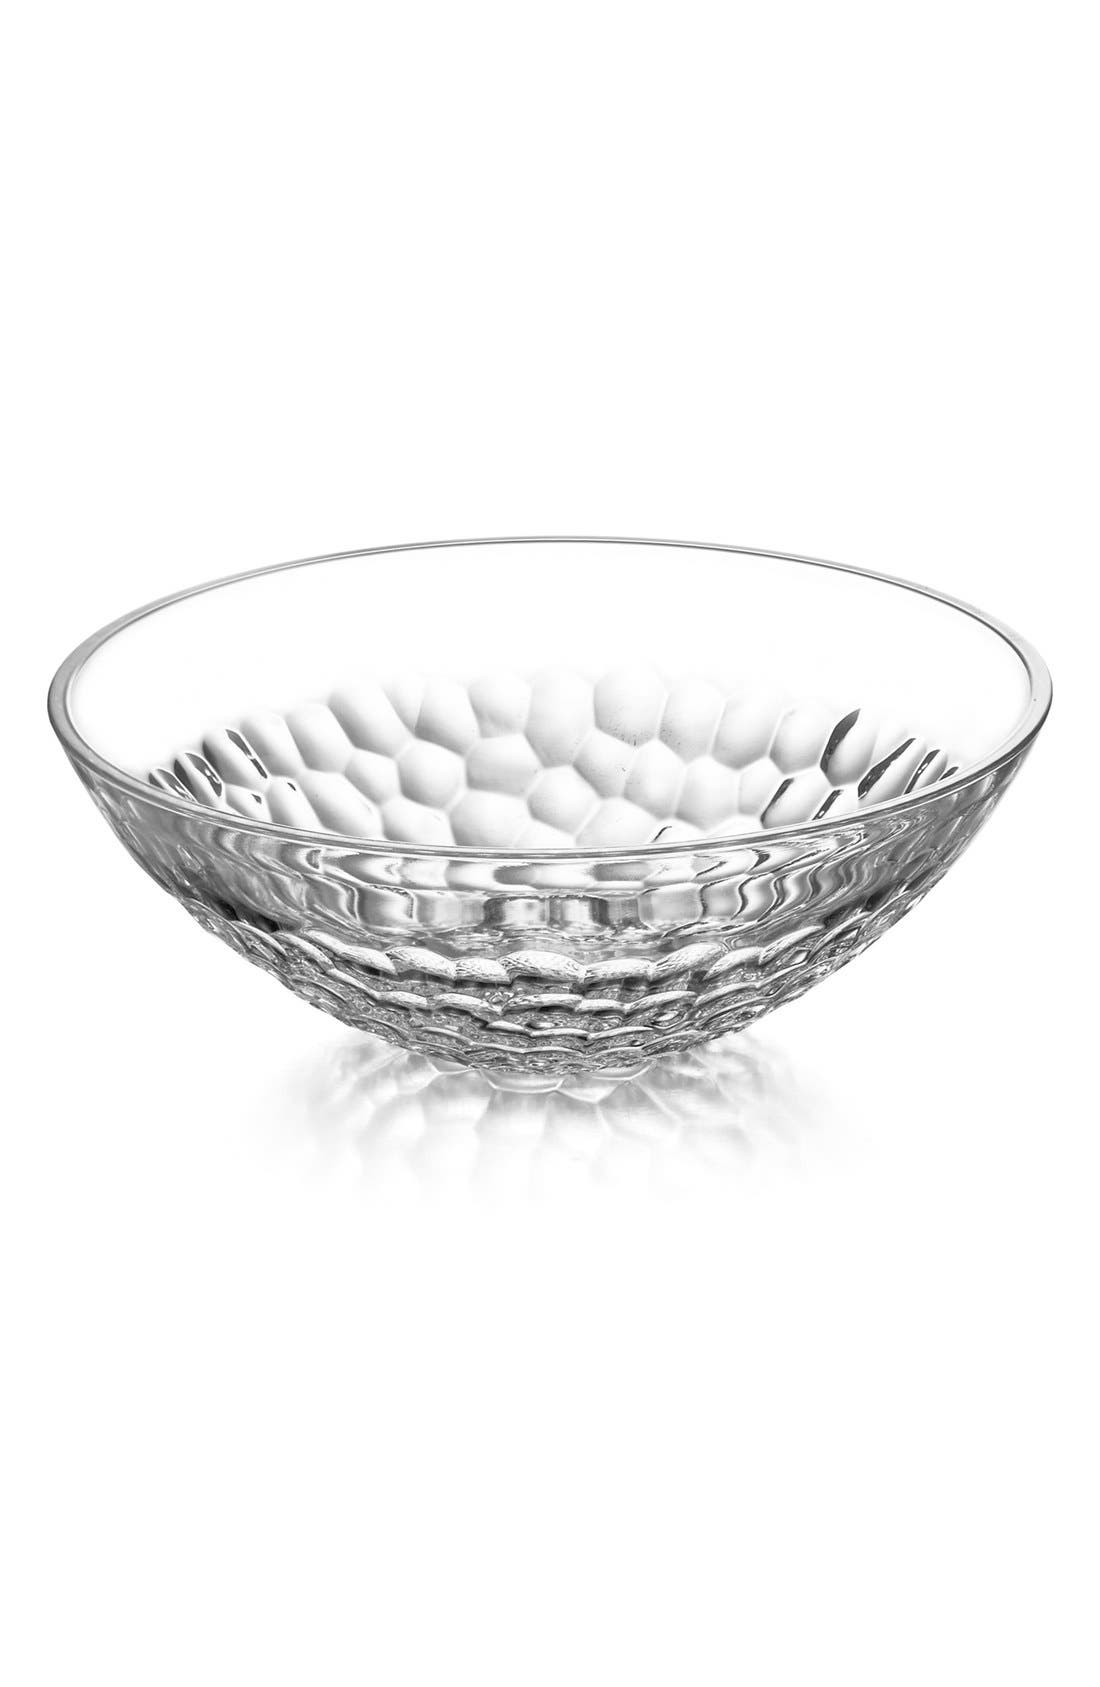 'Pearl' Lead Crystal Serving Bowl,                             Main thumbnail 1, color,                             100